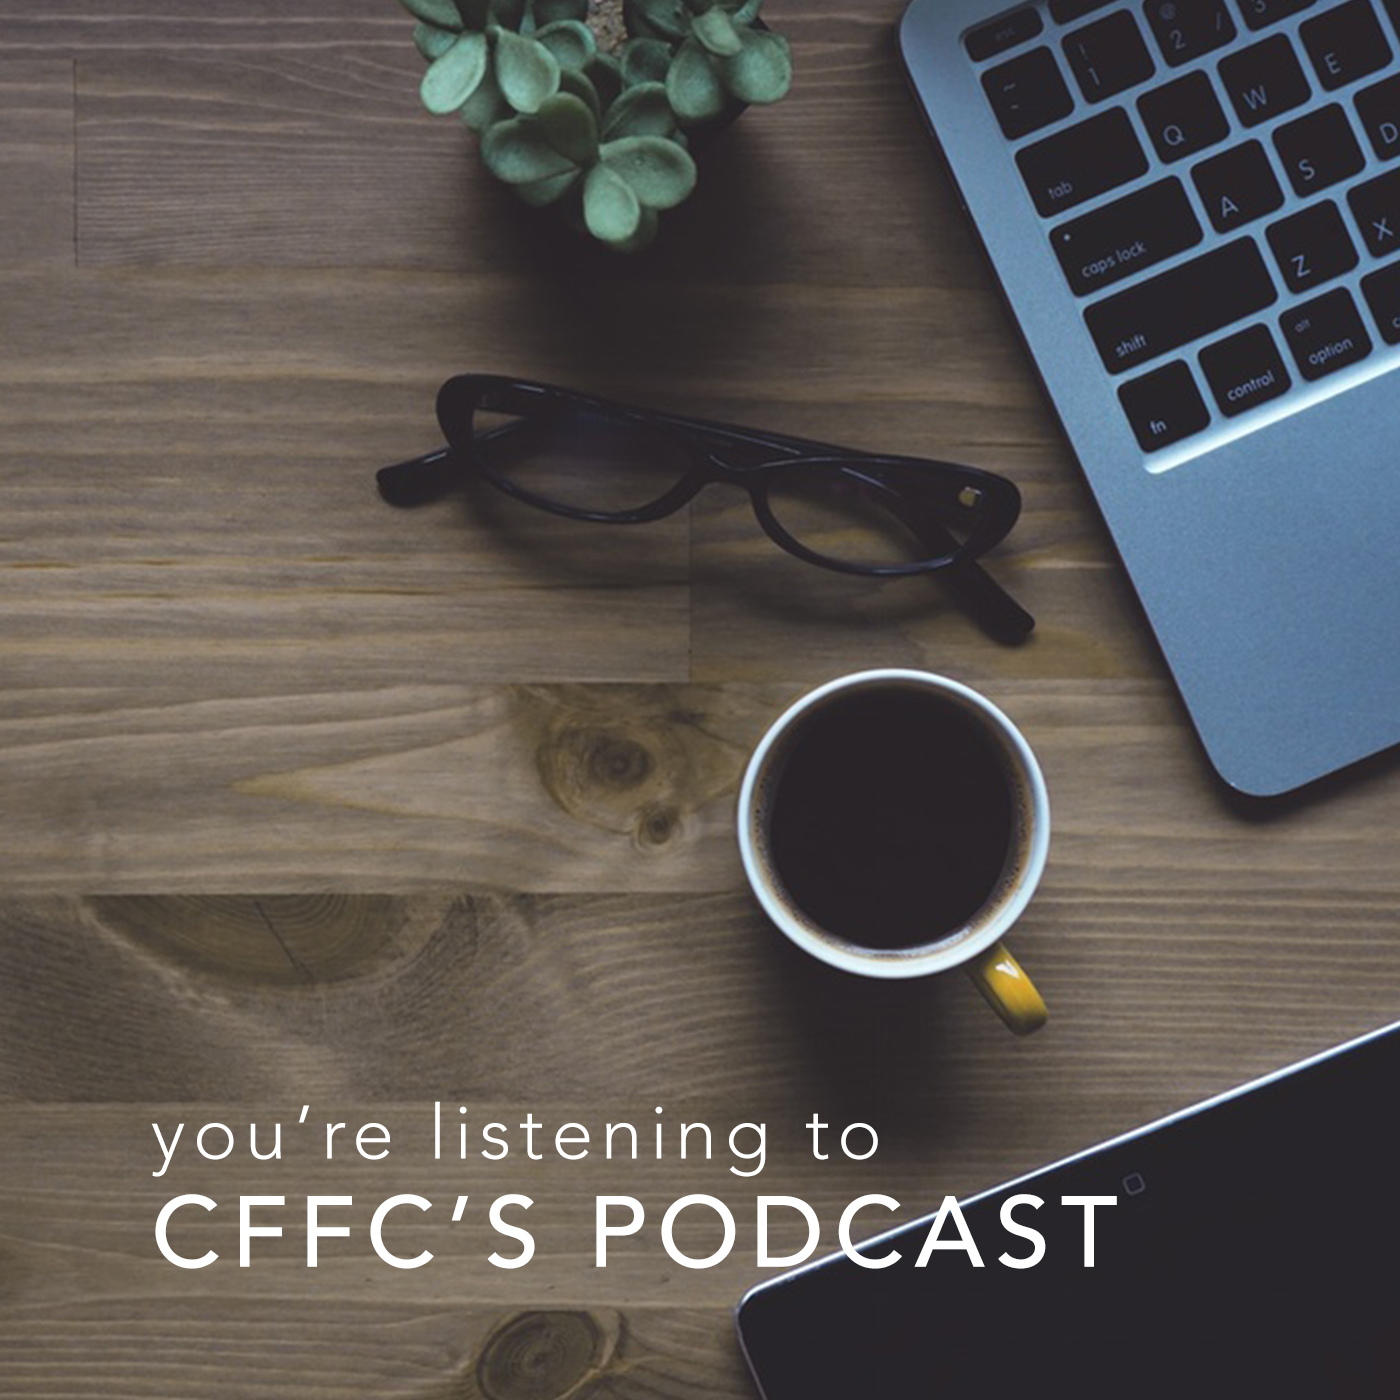 CFFC's Podcast show art